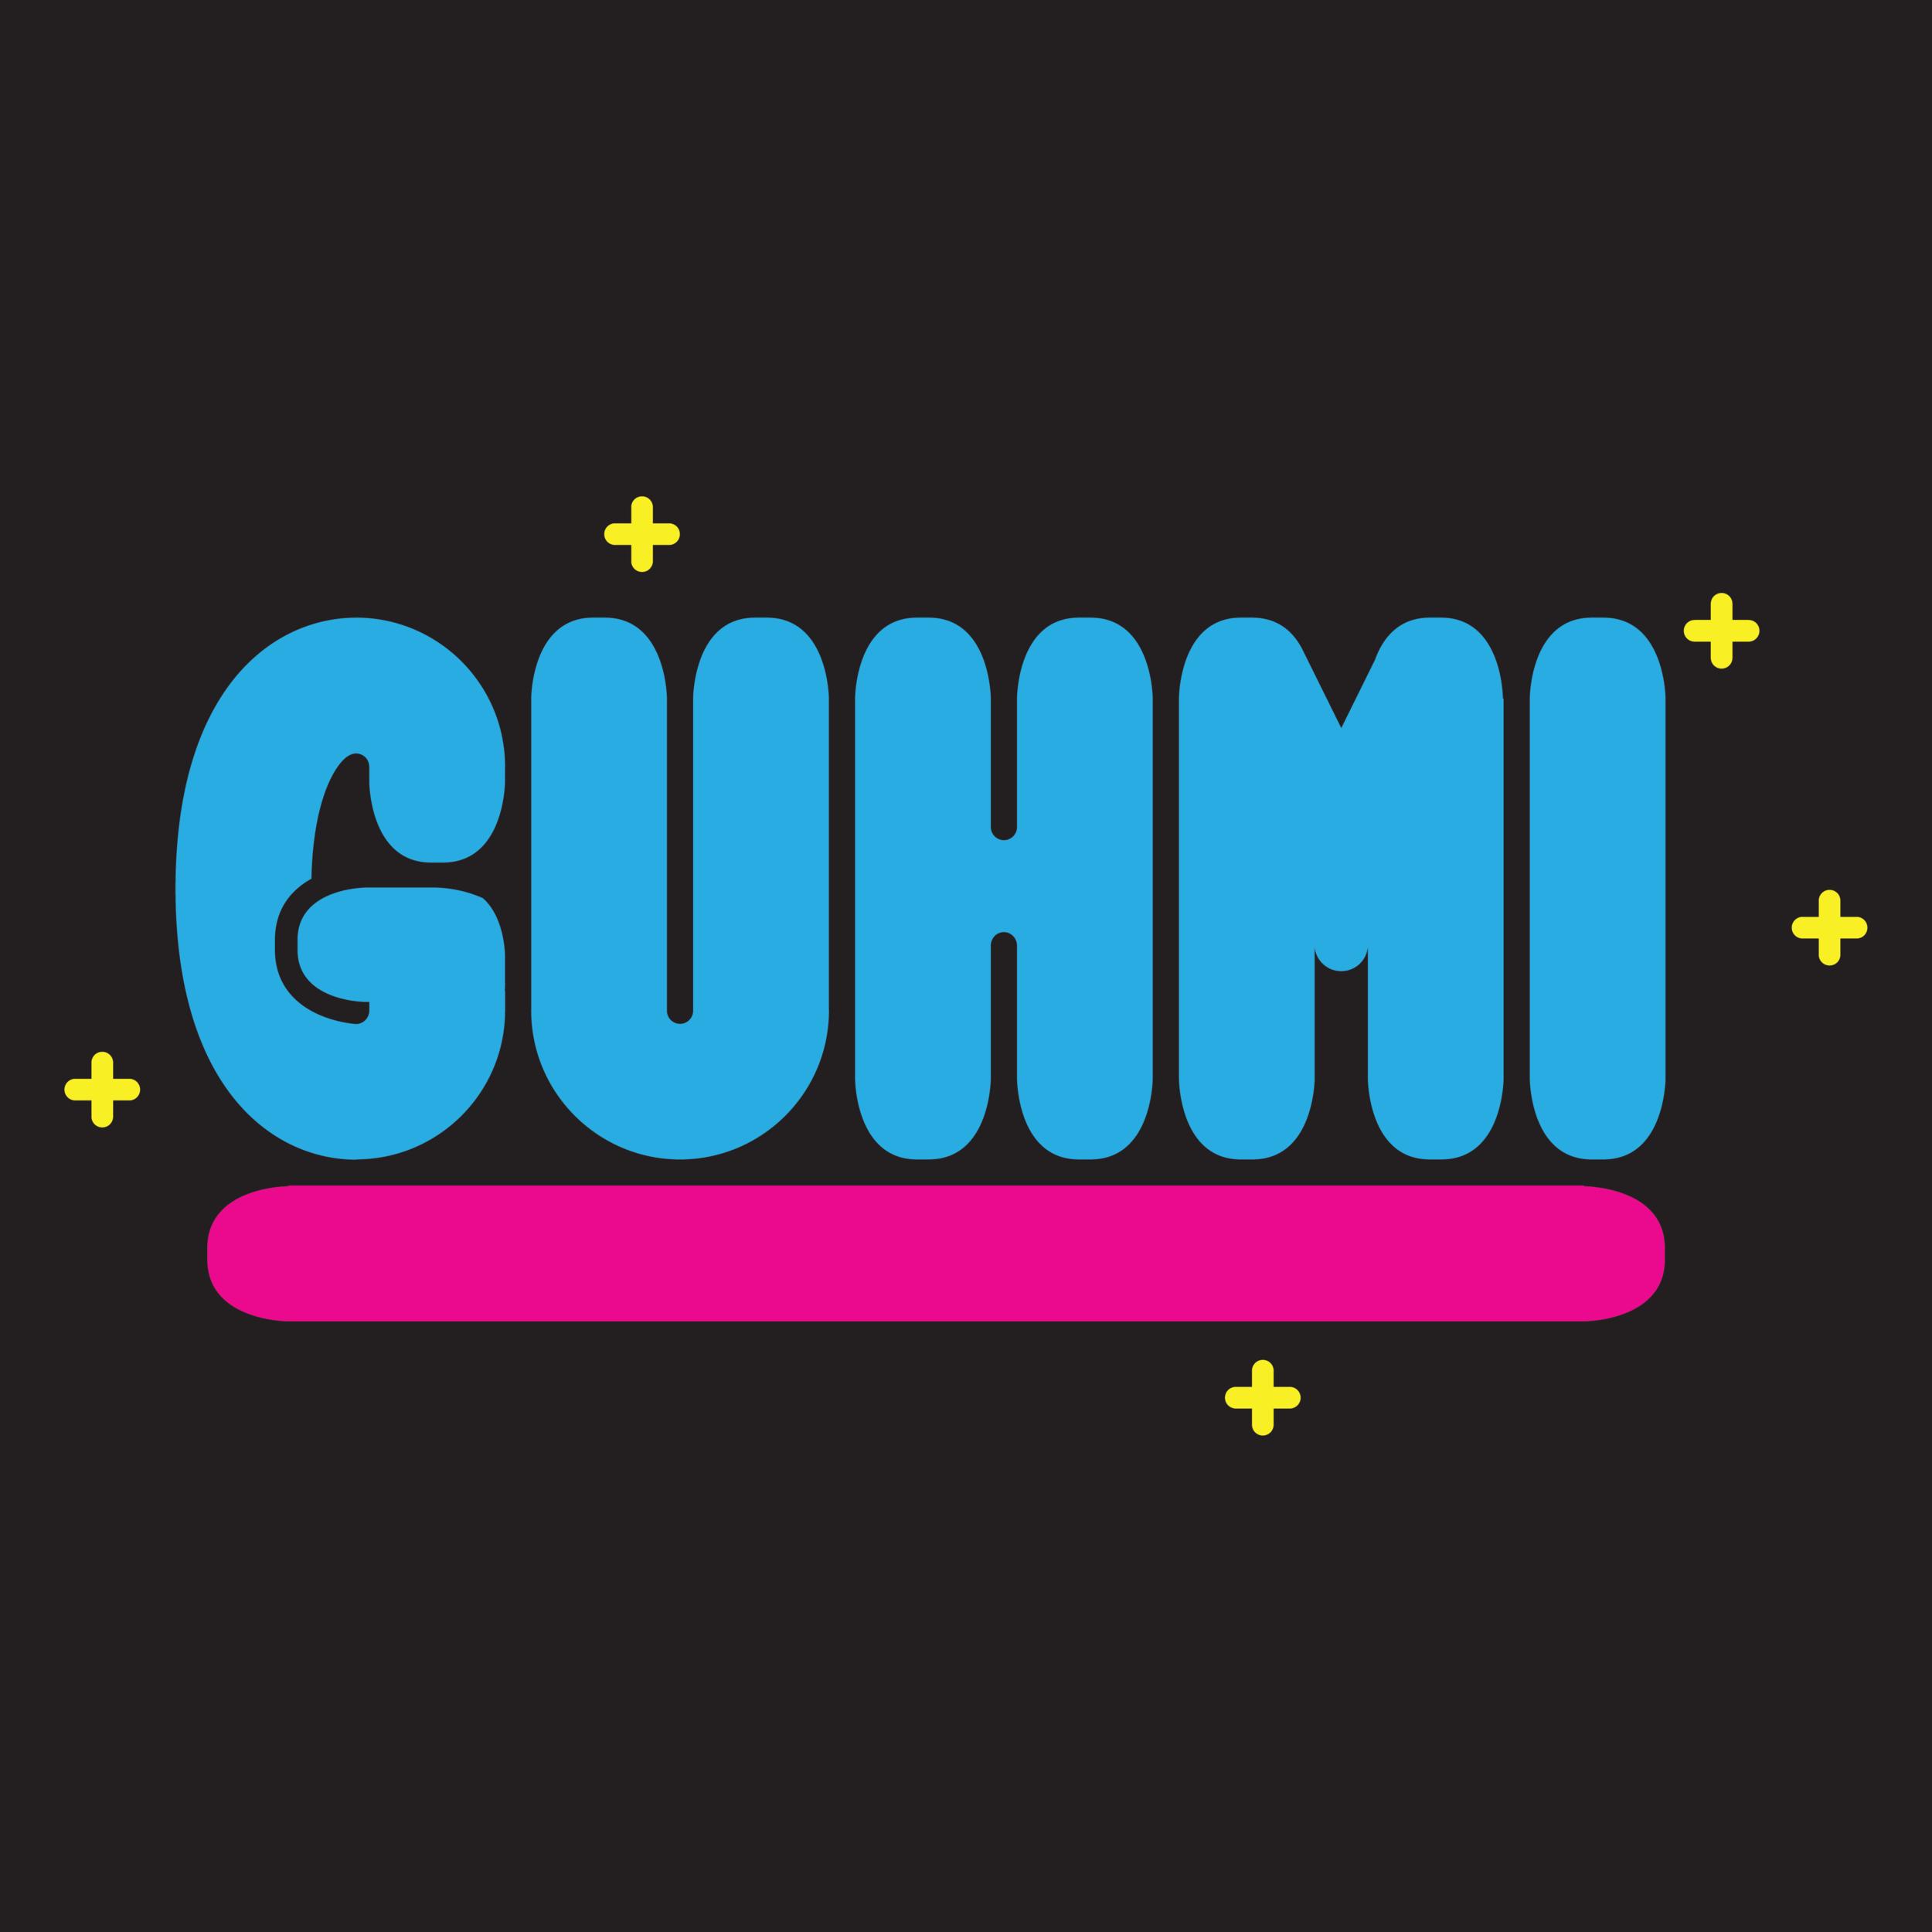 Guhmi -